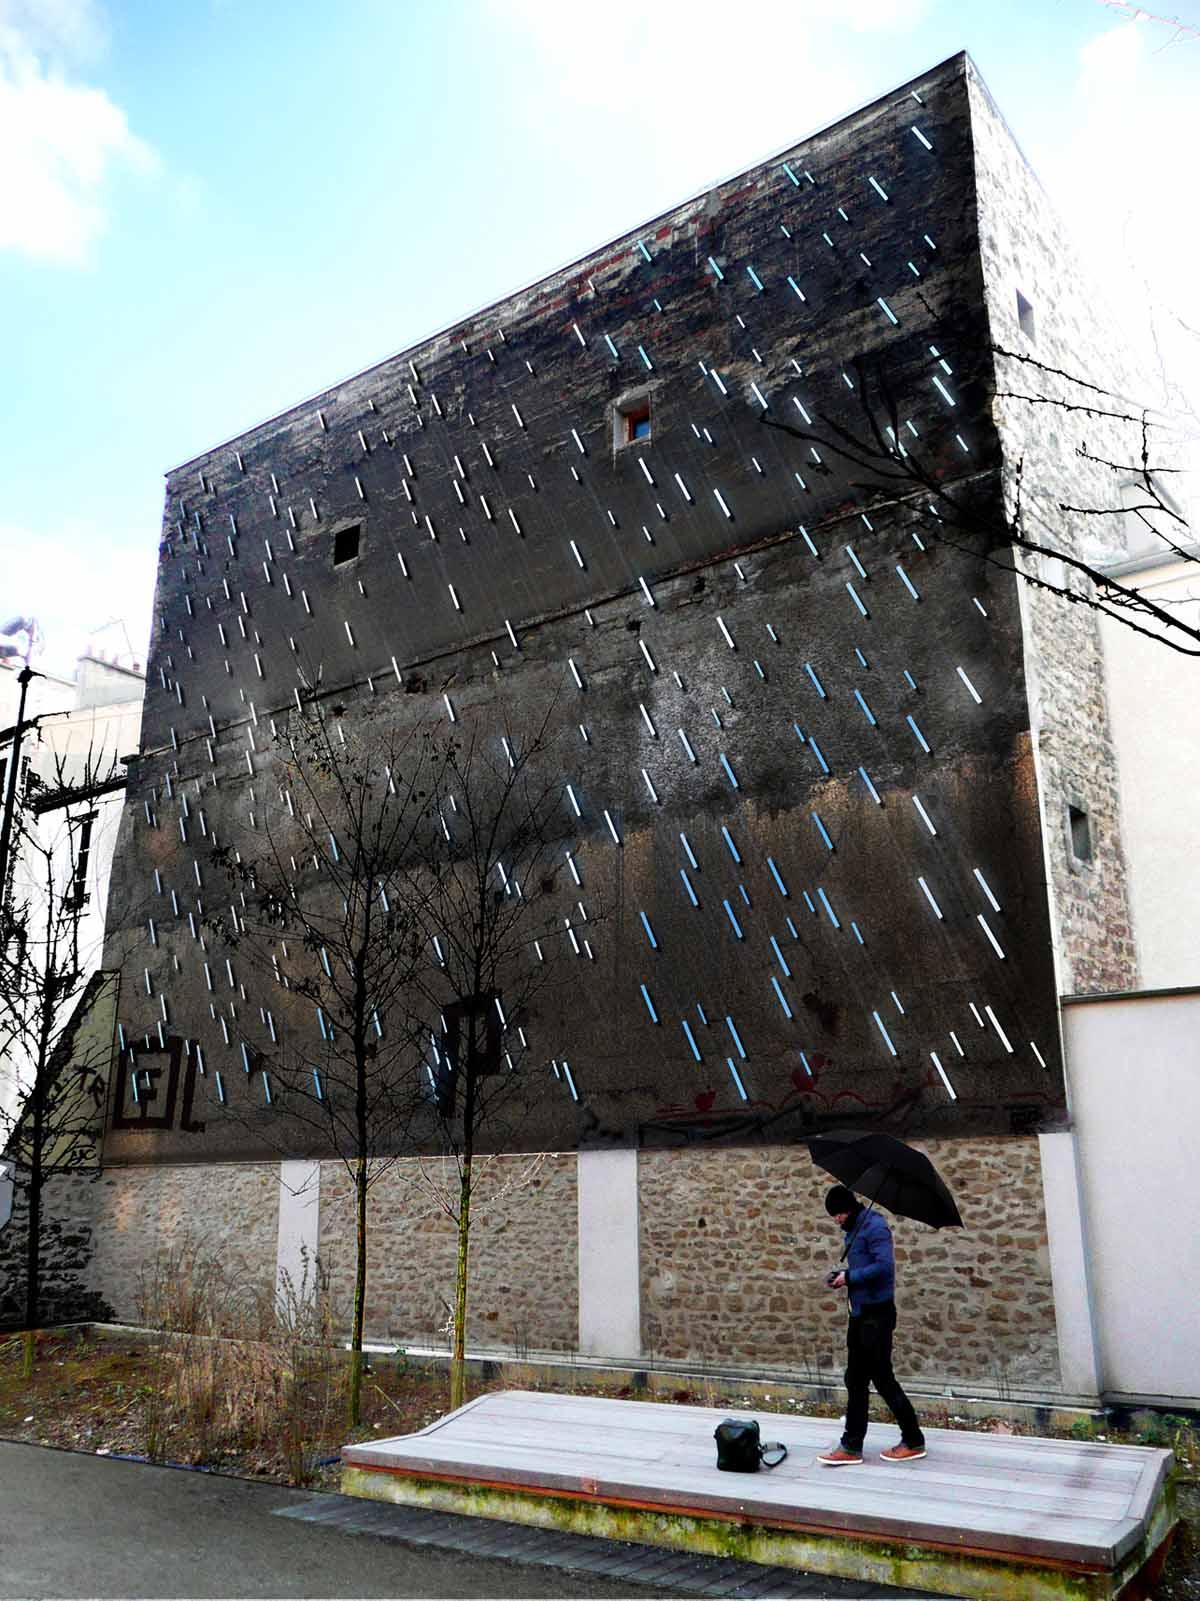 gbrusset-Jour de pluie 01